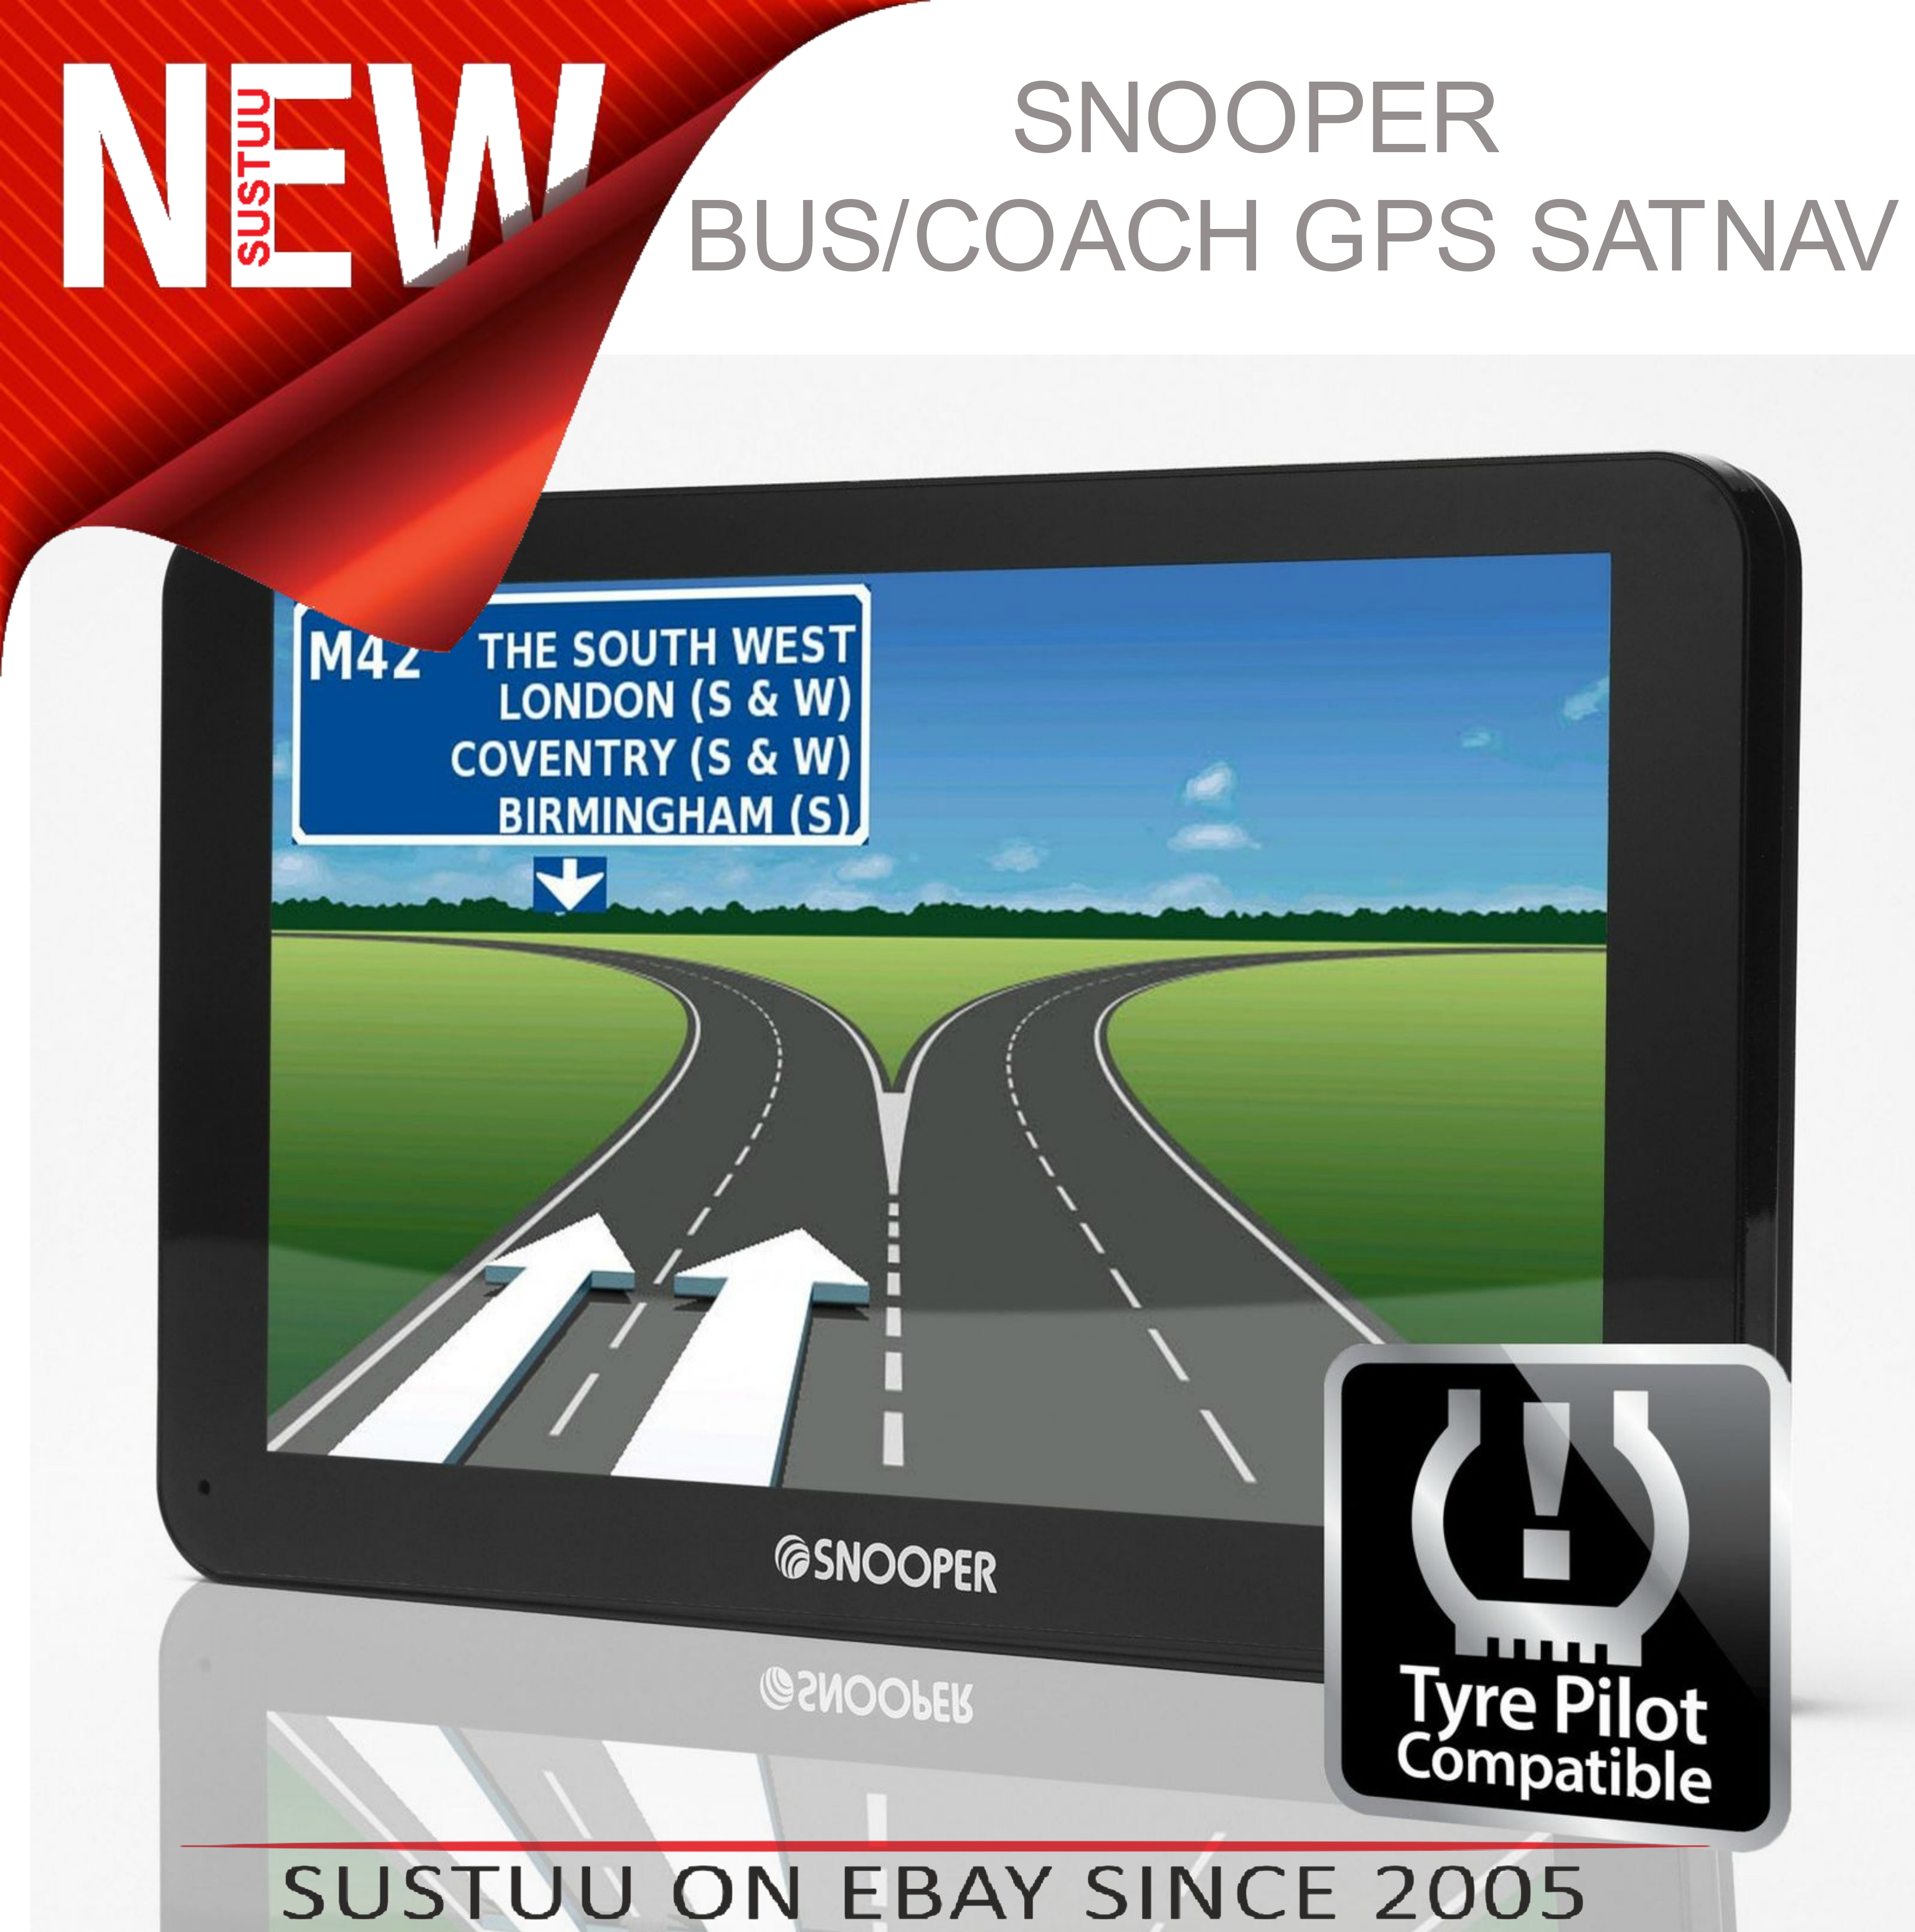 Snooper Bus & Coach S6810 7? GPS Sat Nav FREE LIFETIME UK/EUROPE Maps & Traffic